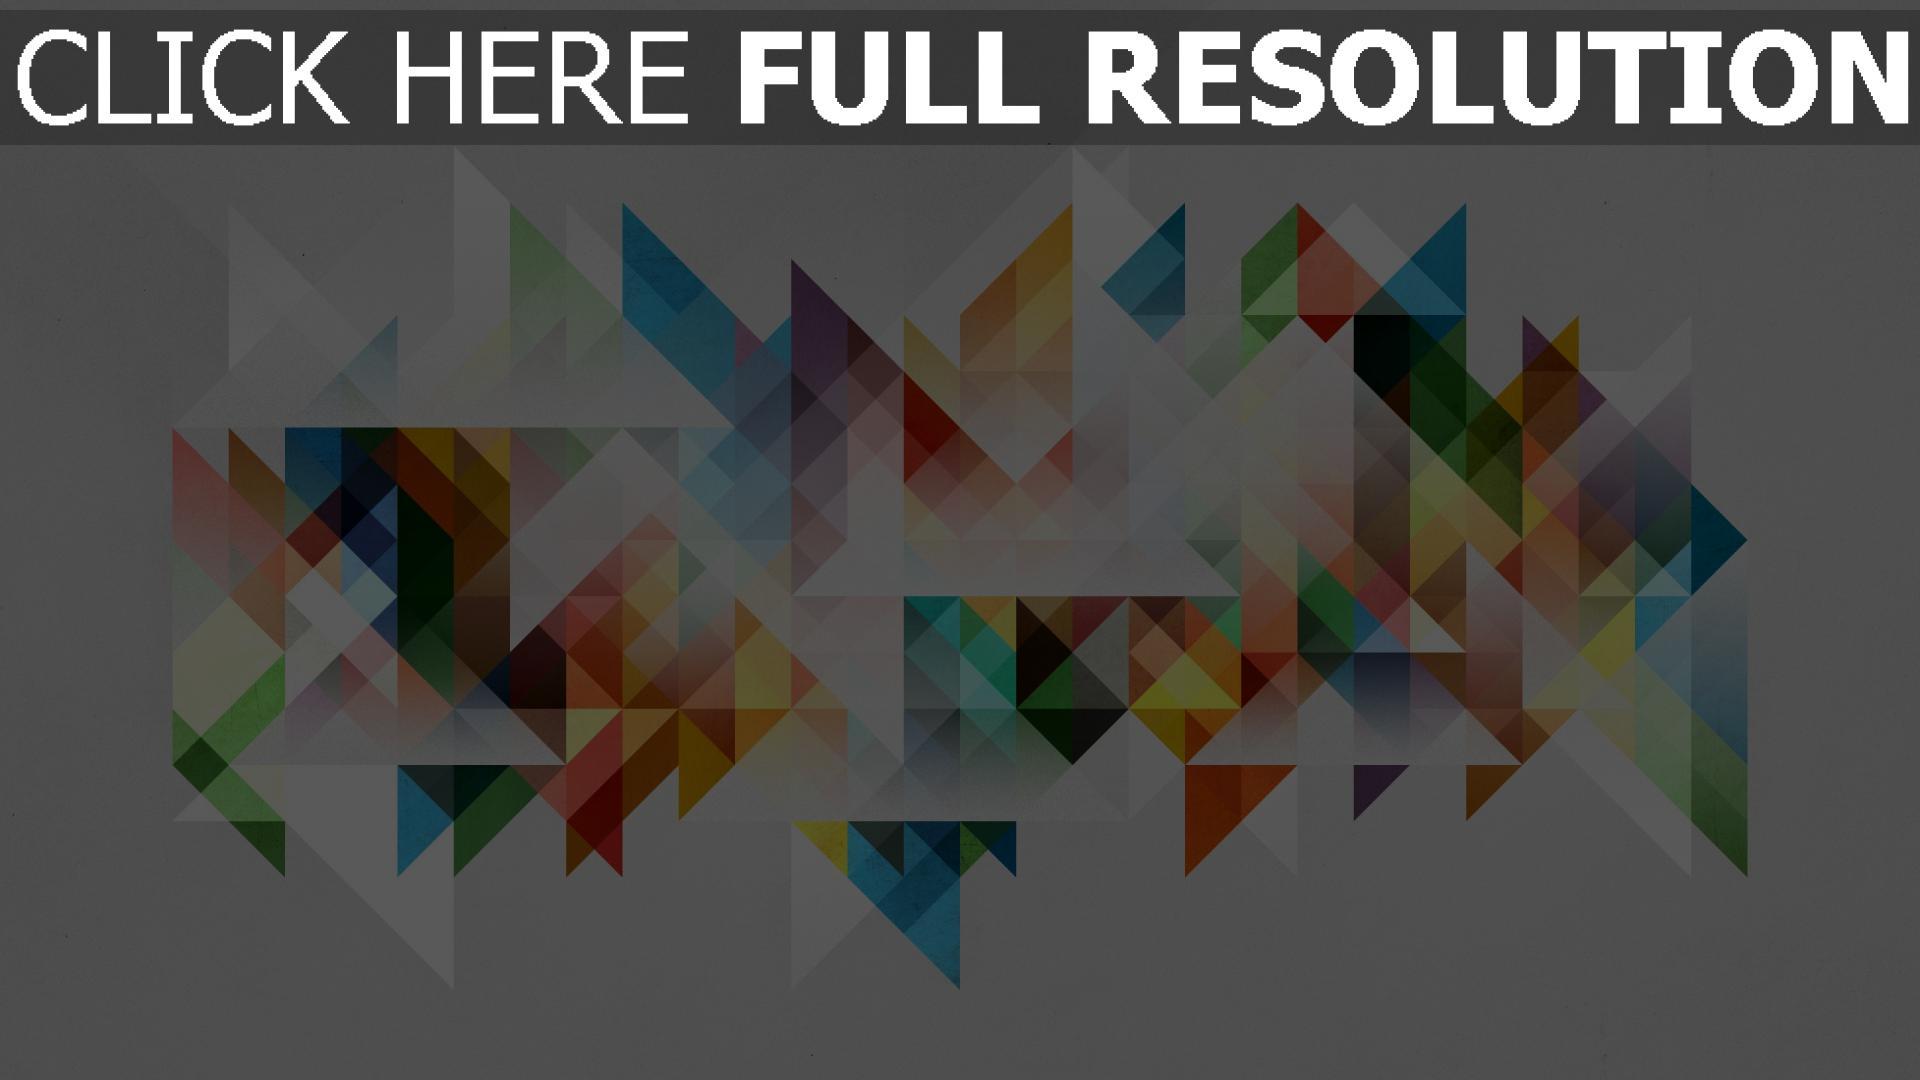 hd hintergrundbilder Farben Geometrie Formen Abstraktion 1920x1080